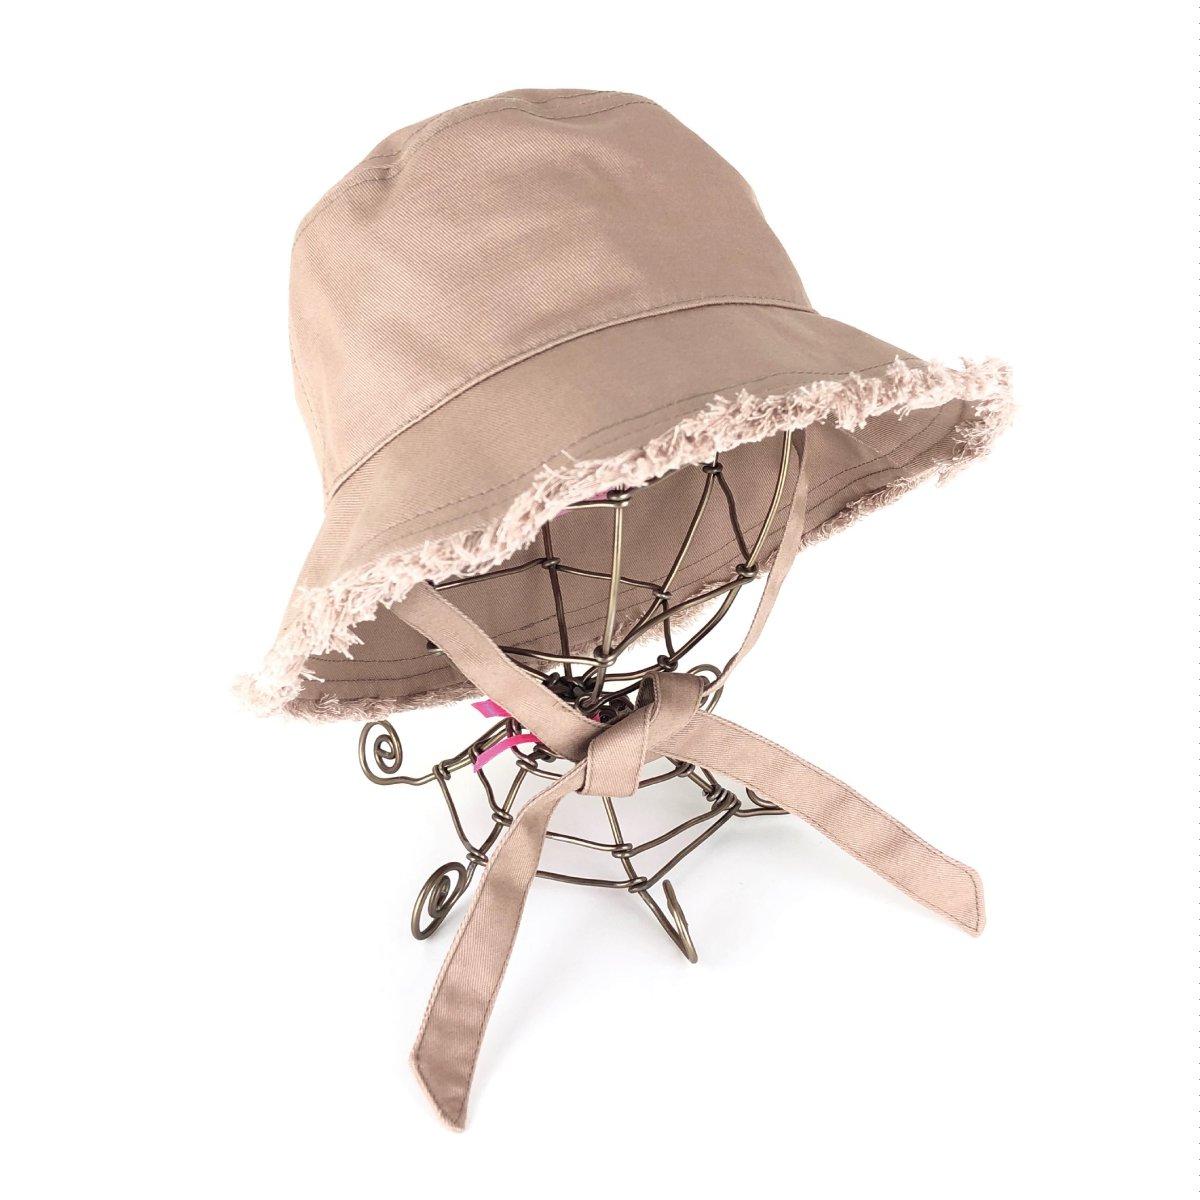 【BABY】Baby Fringe Hat 詳細画像8